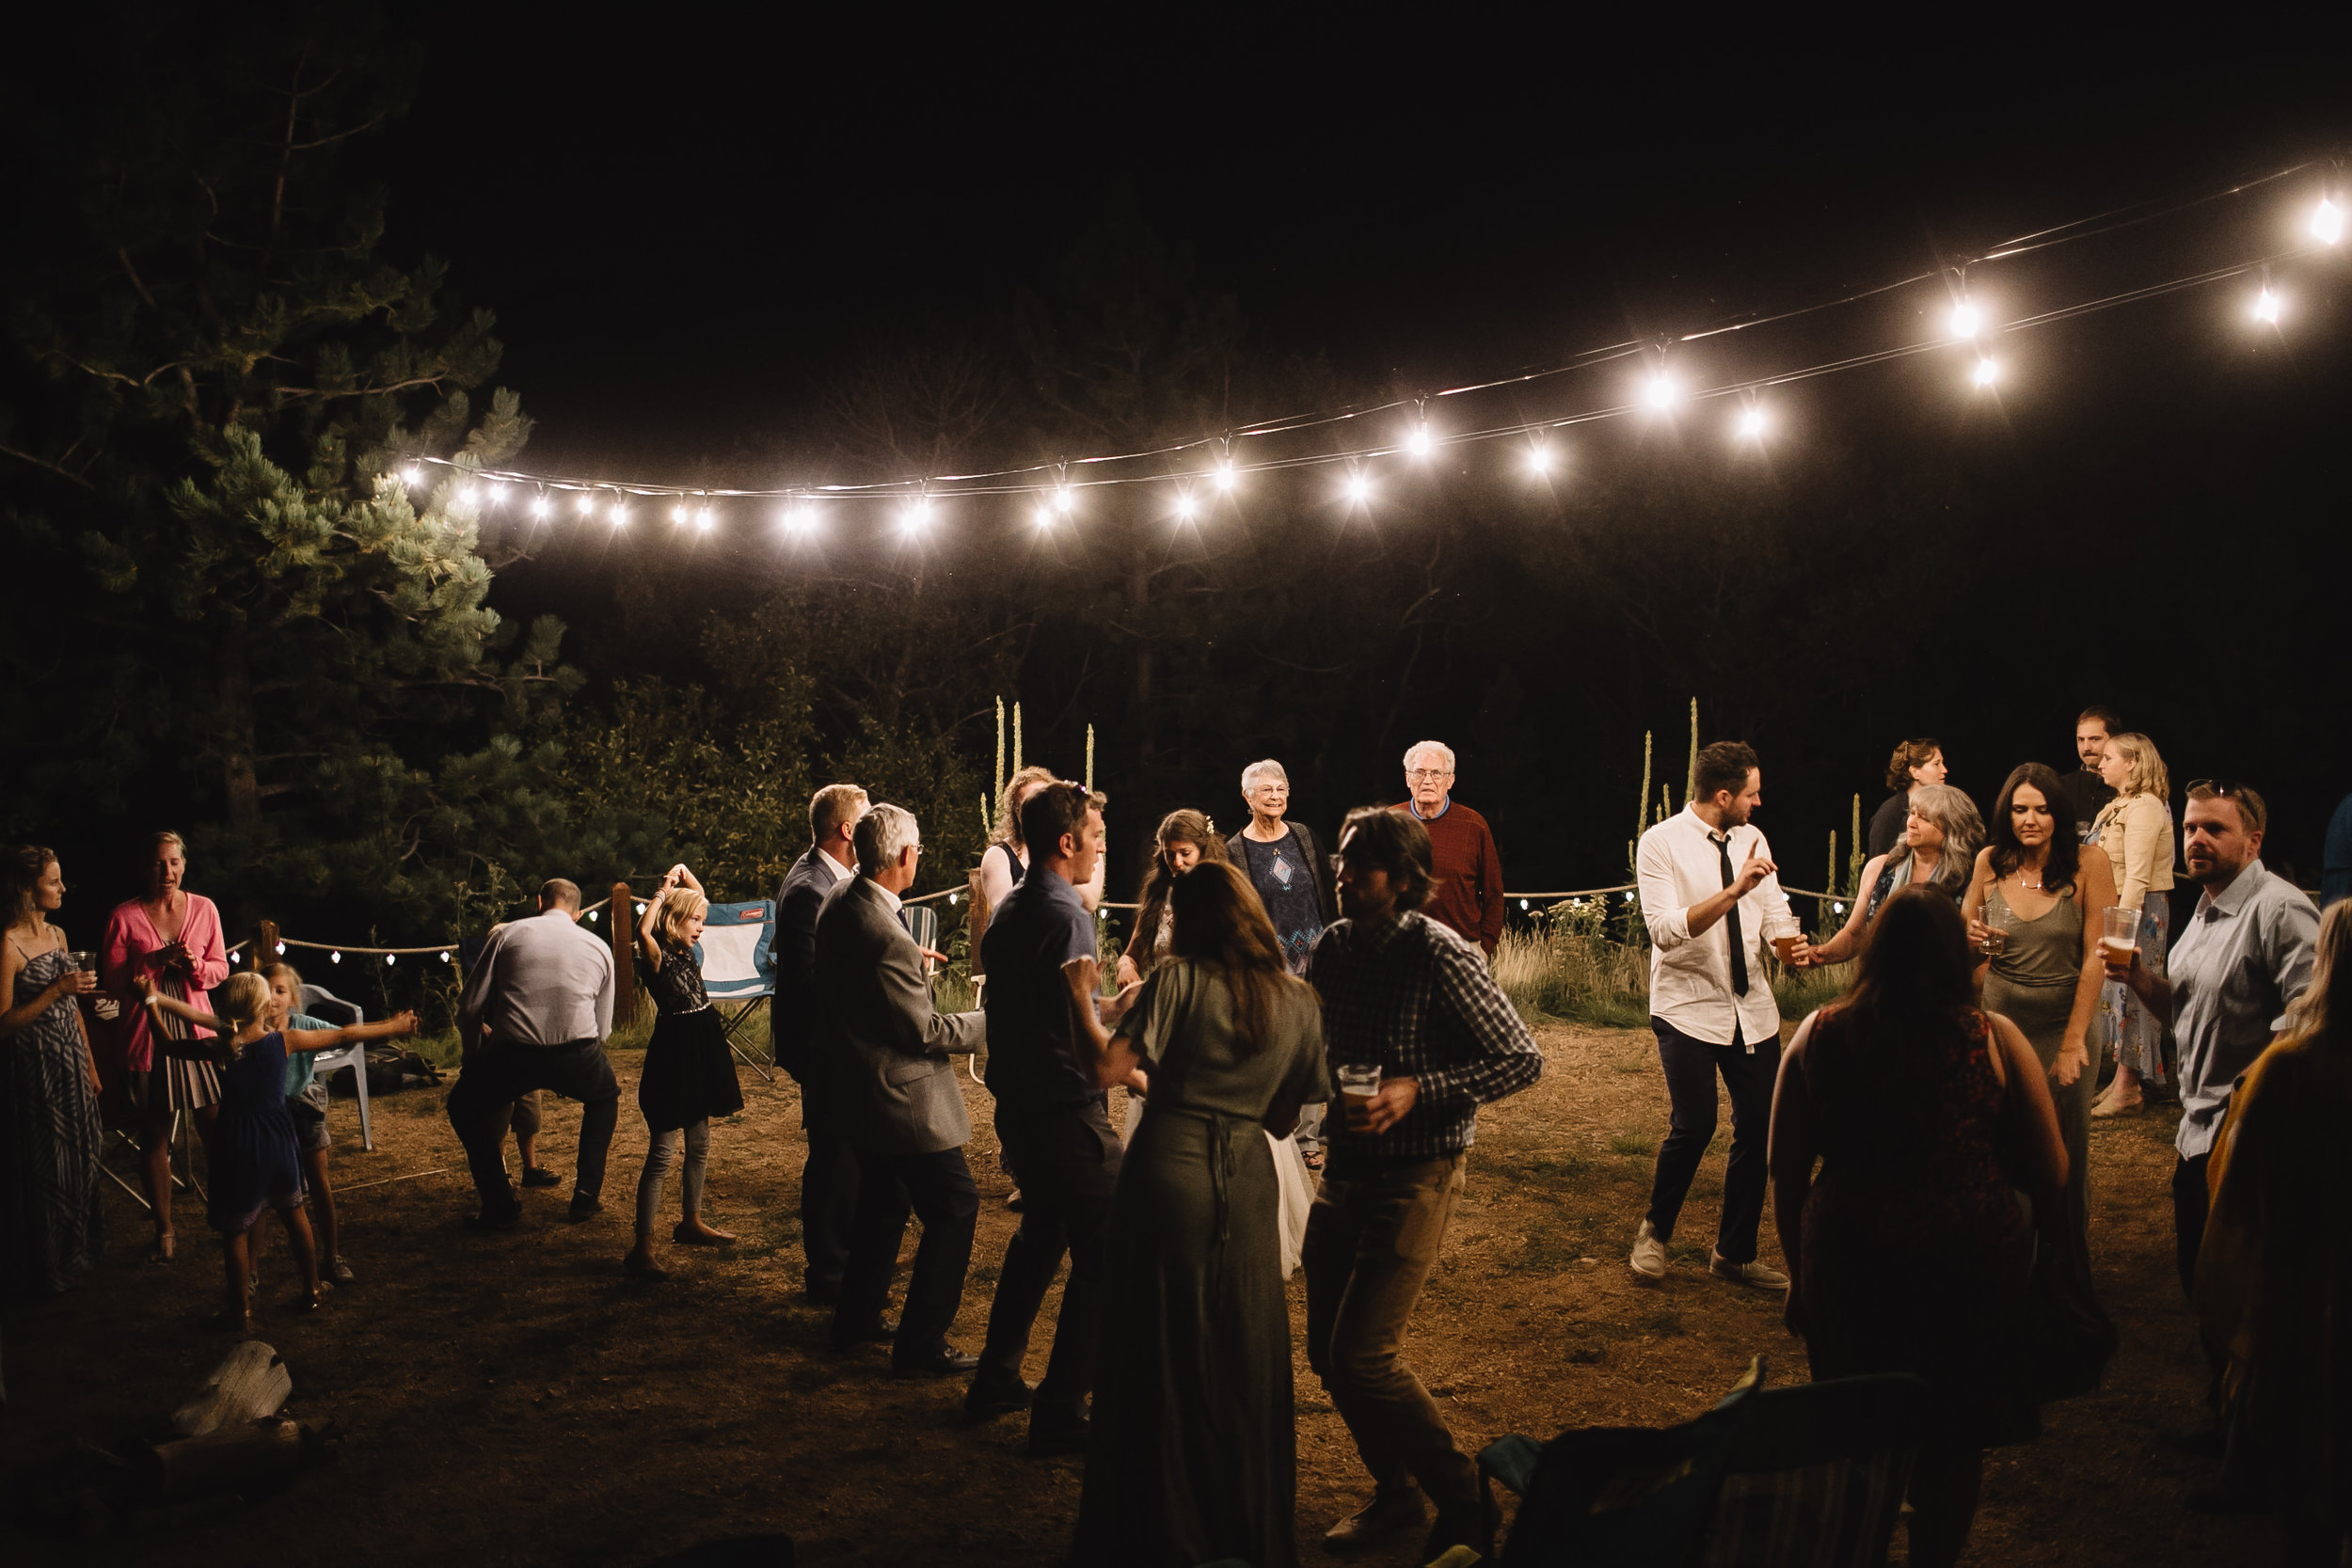 Liz Osban Photography Vedauwoo Buford Wyoming Happy Jack Wedding Elopement Destination Small Forest Cheyenne Laramie Medicine Bow National Forest Reception Belafuco's Pizza23.jpg